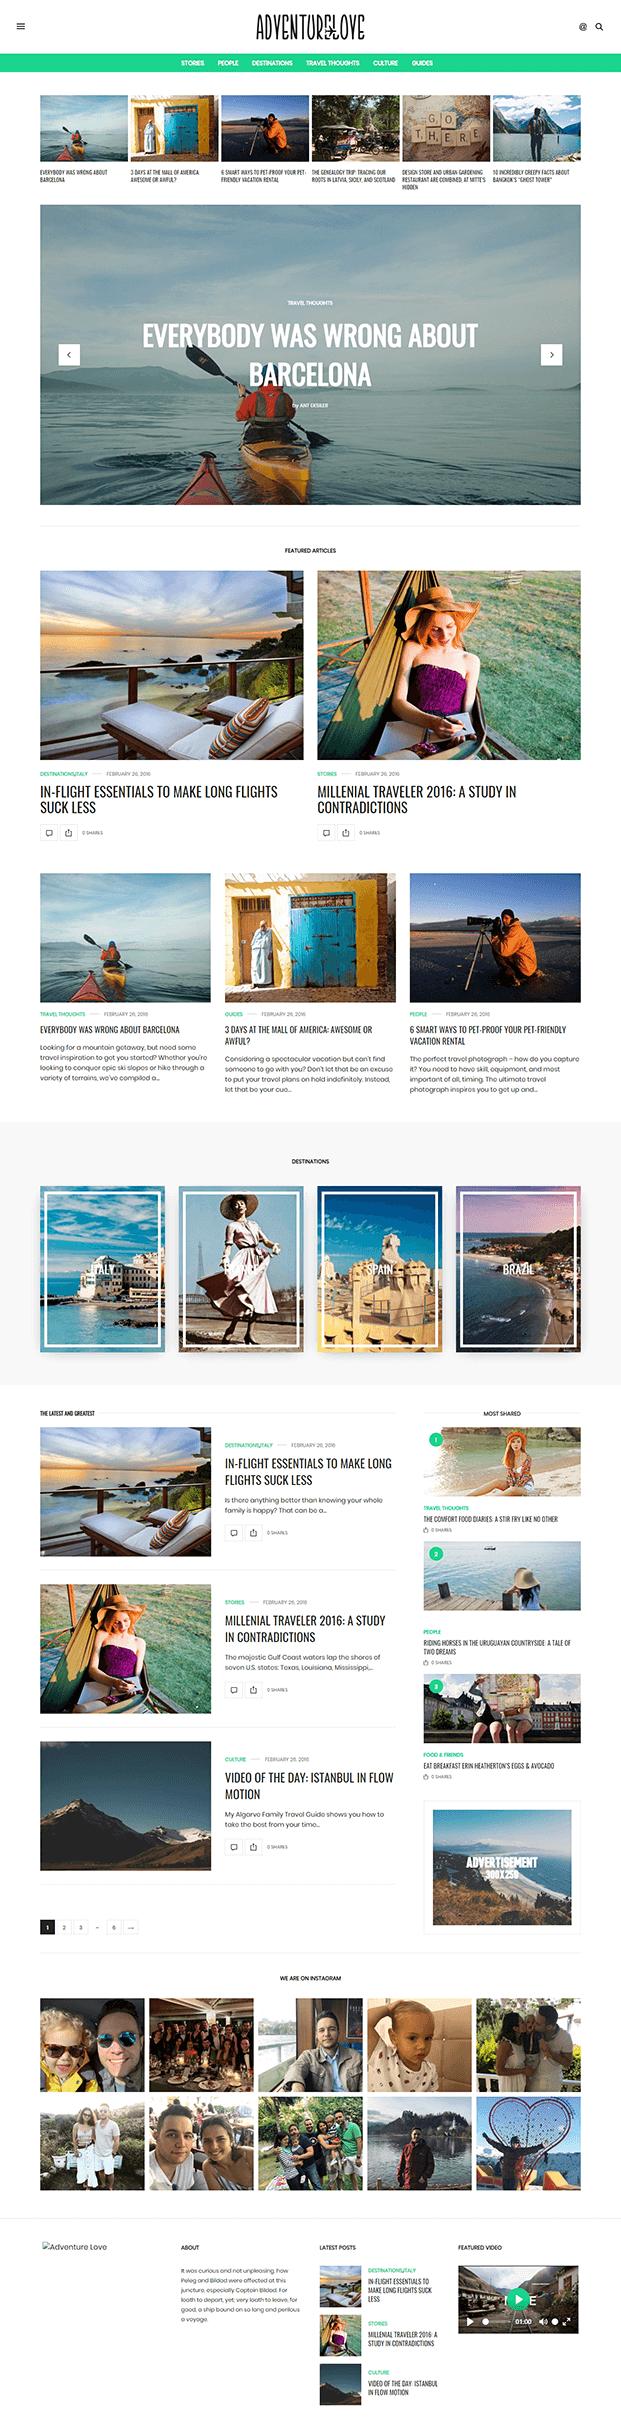 Home - Best WordPress Magazine Theme